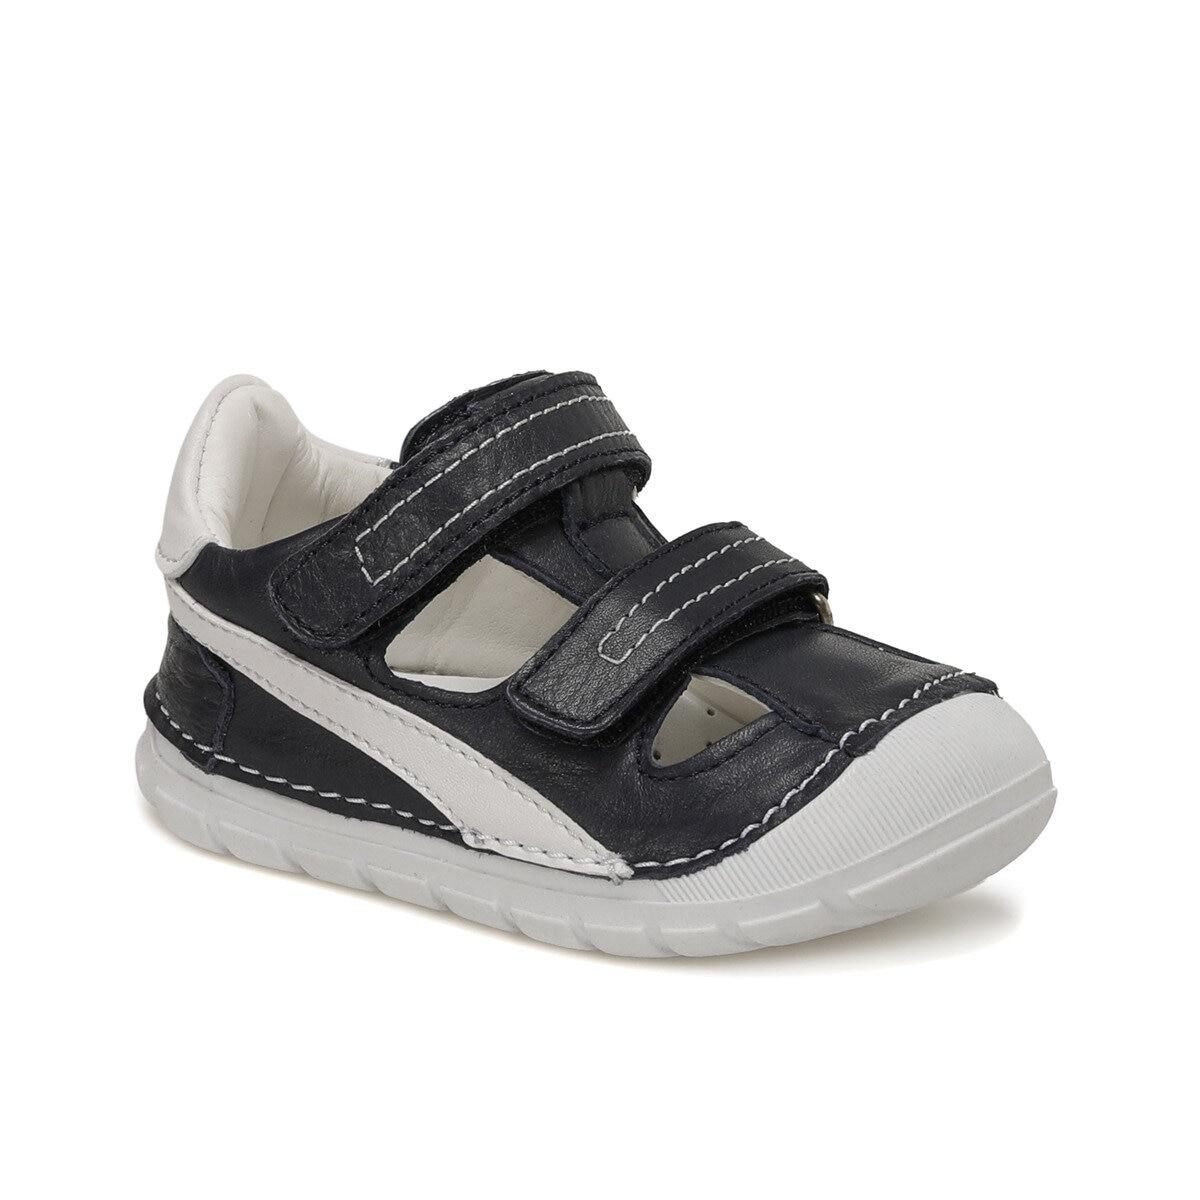 FLO 512205.I Navy Blue Male Child Sneaker Shoes Polaris